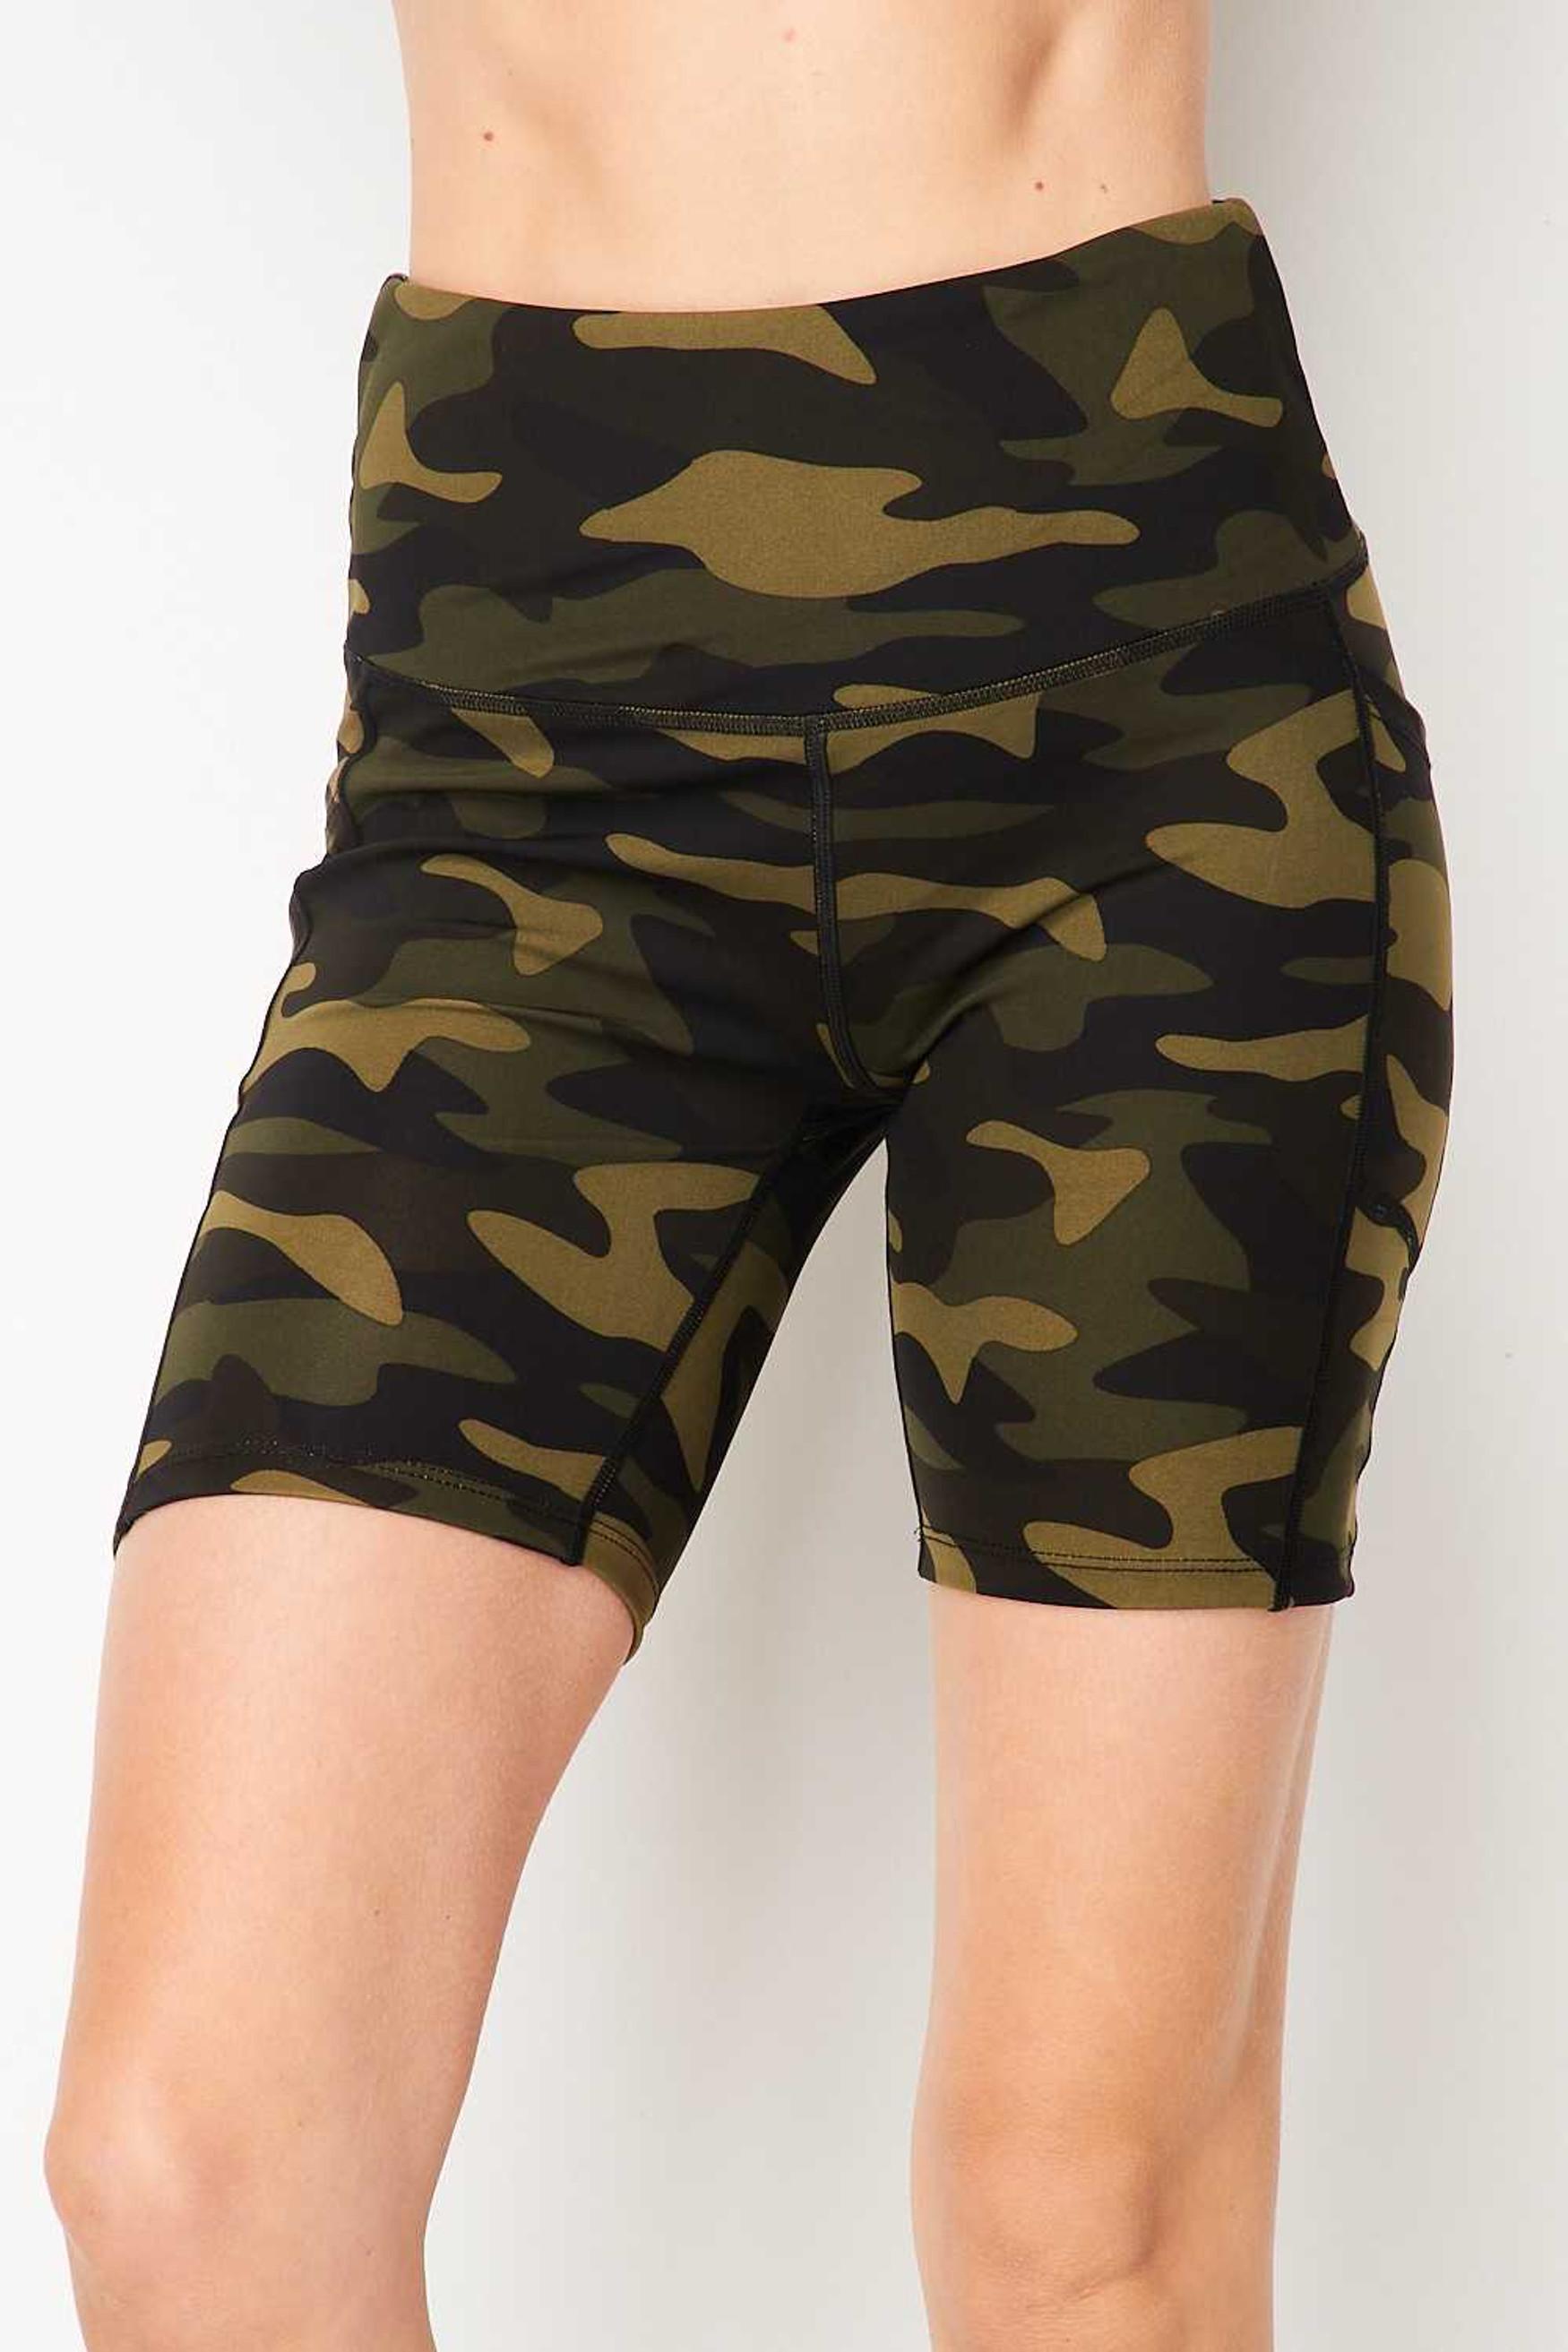 Sport High Waisted Camouflage Biker Shorts